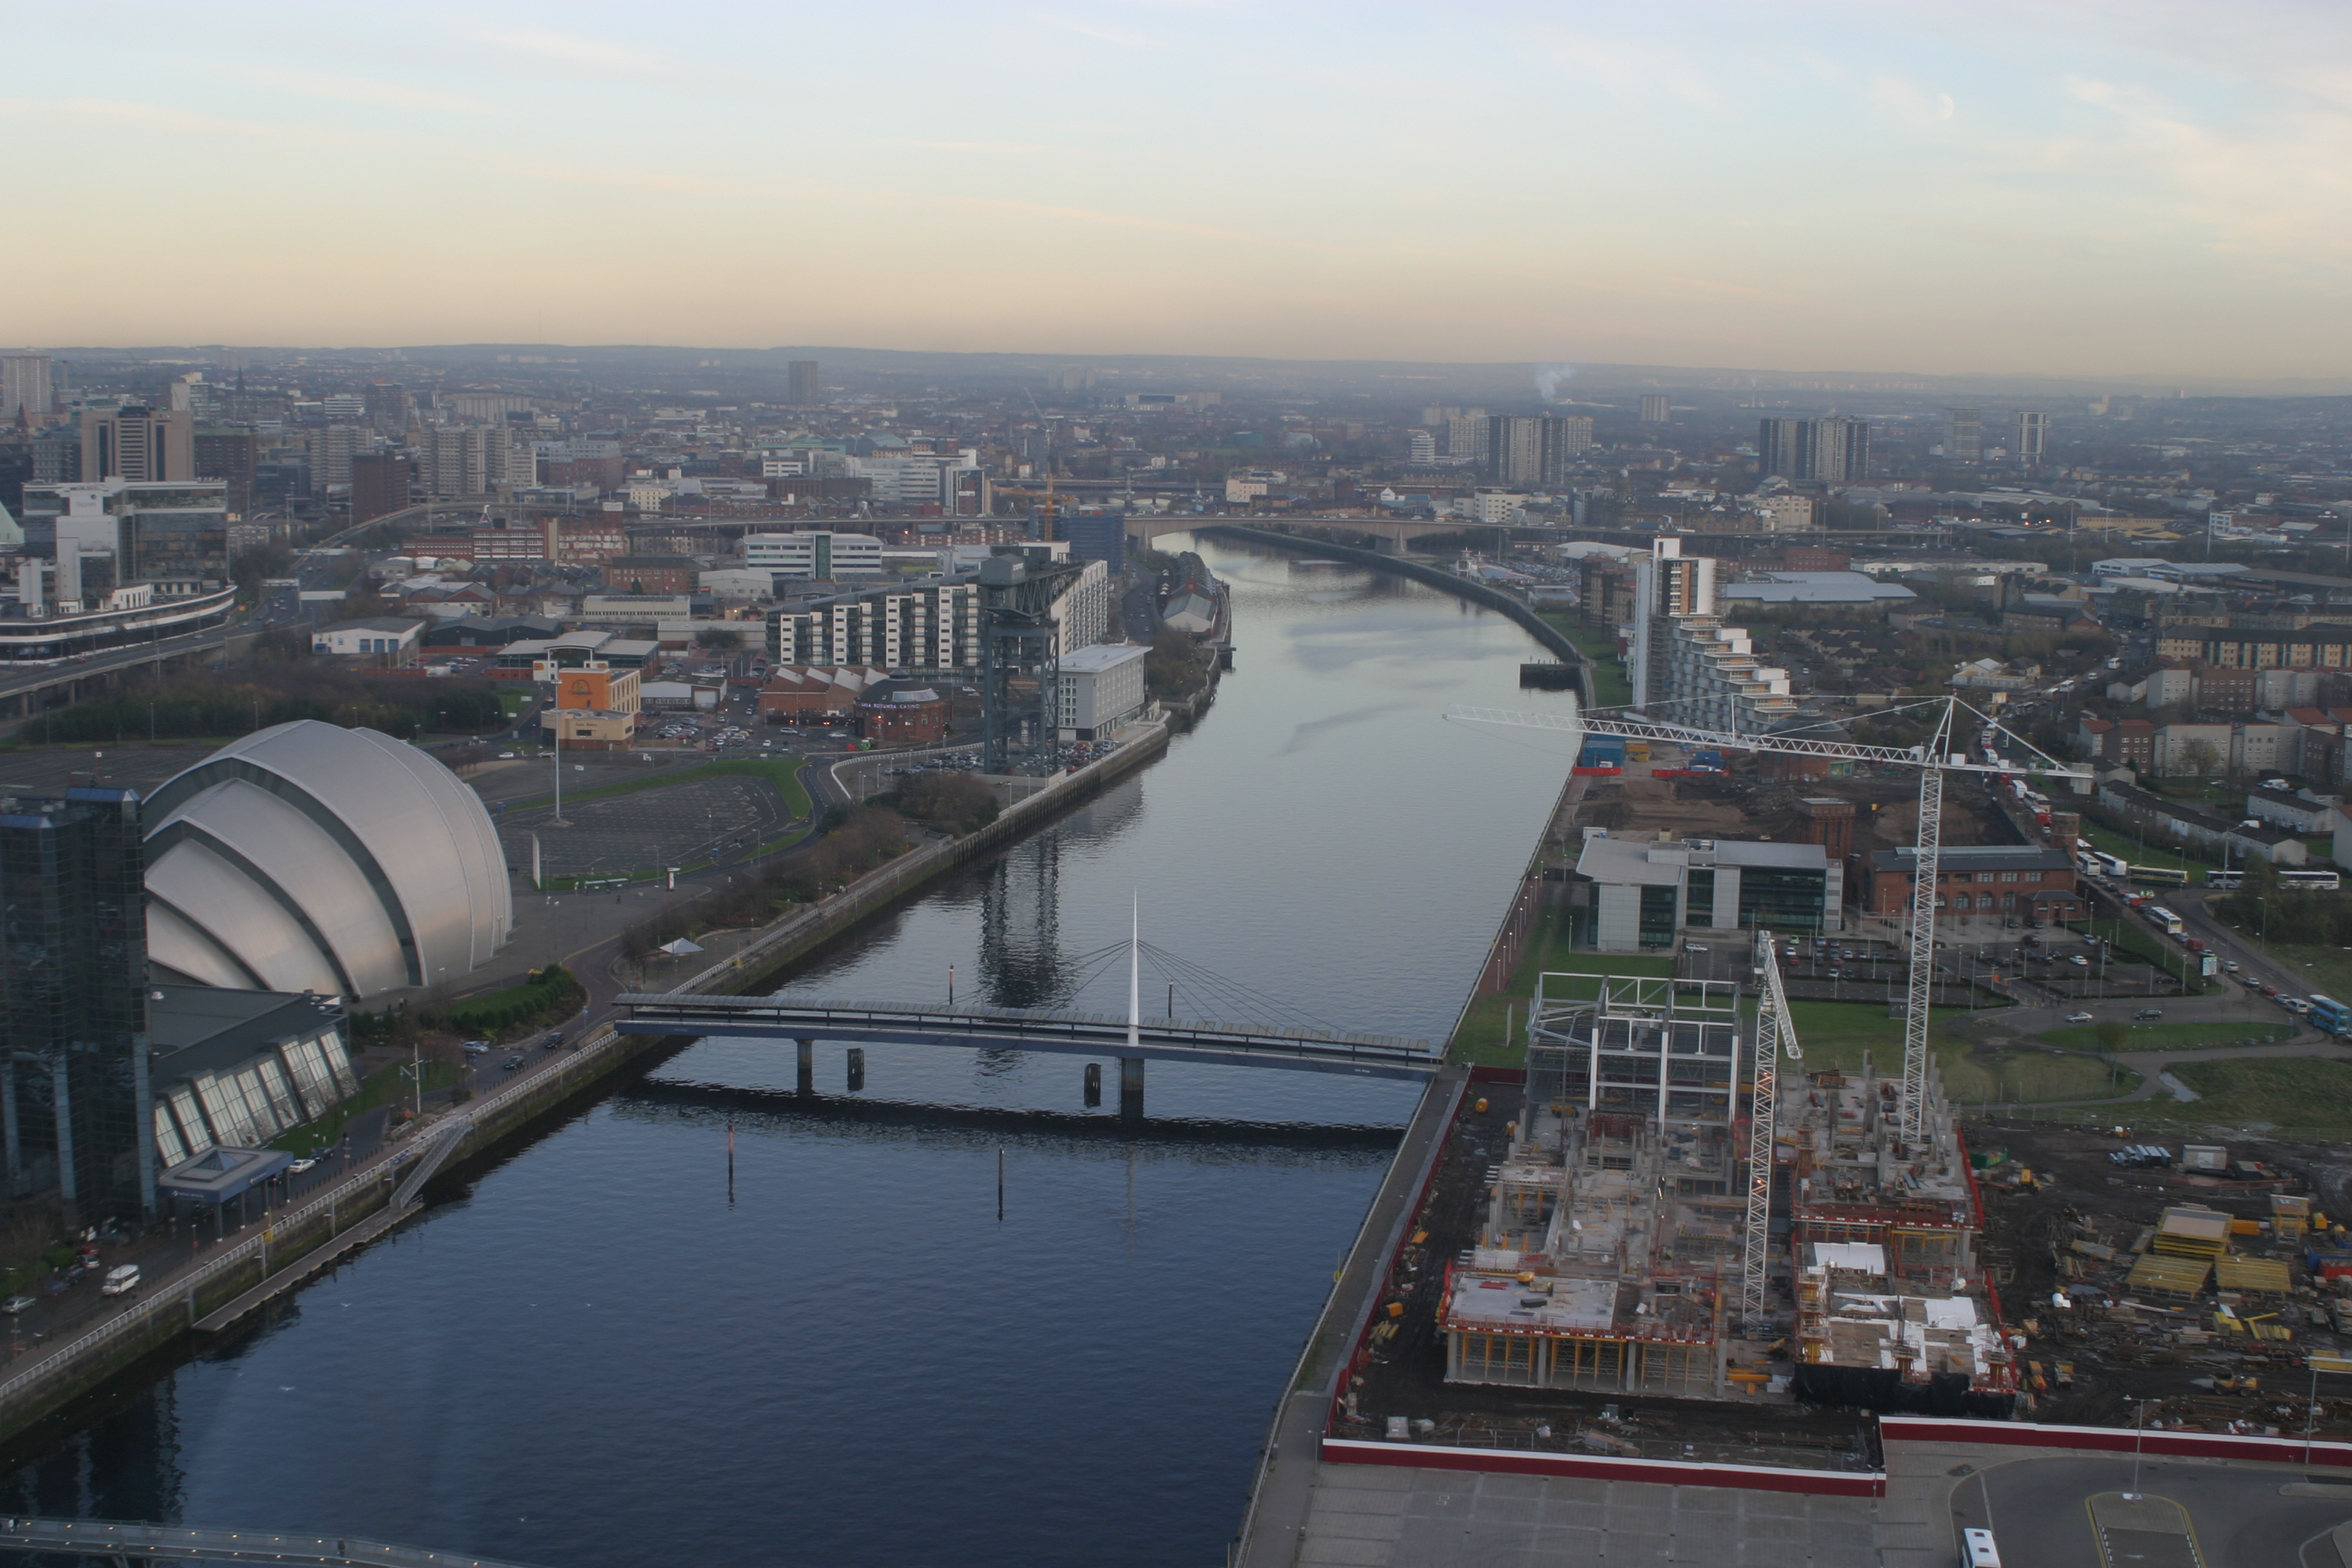 The River Clyde as it runs through Glasgow (iStock)